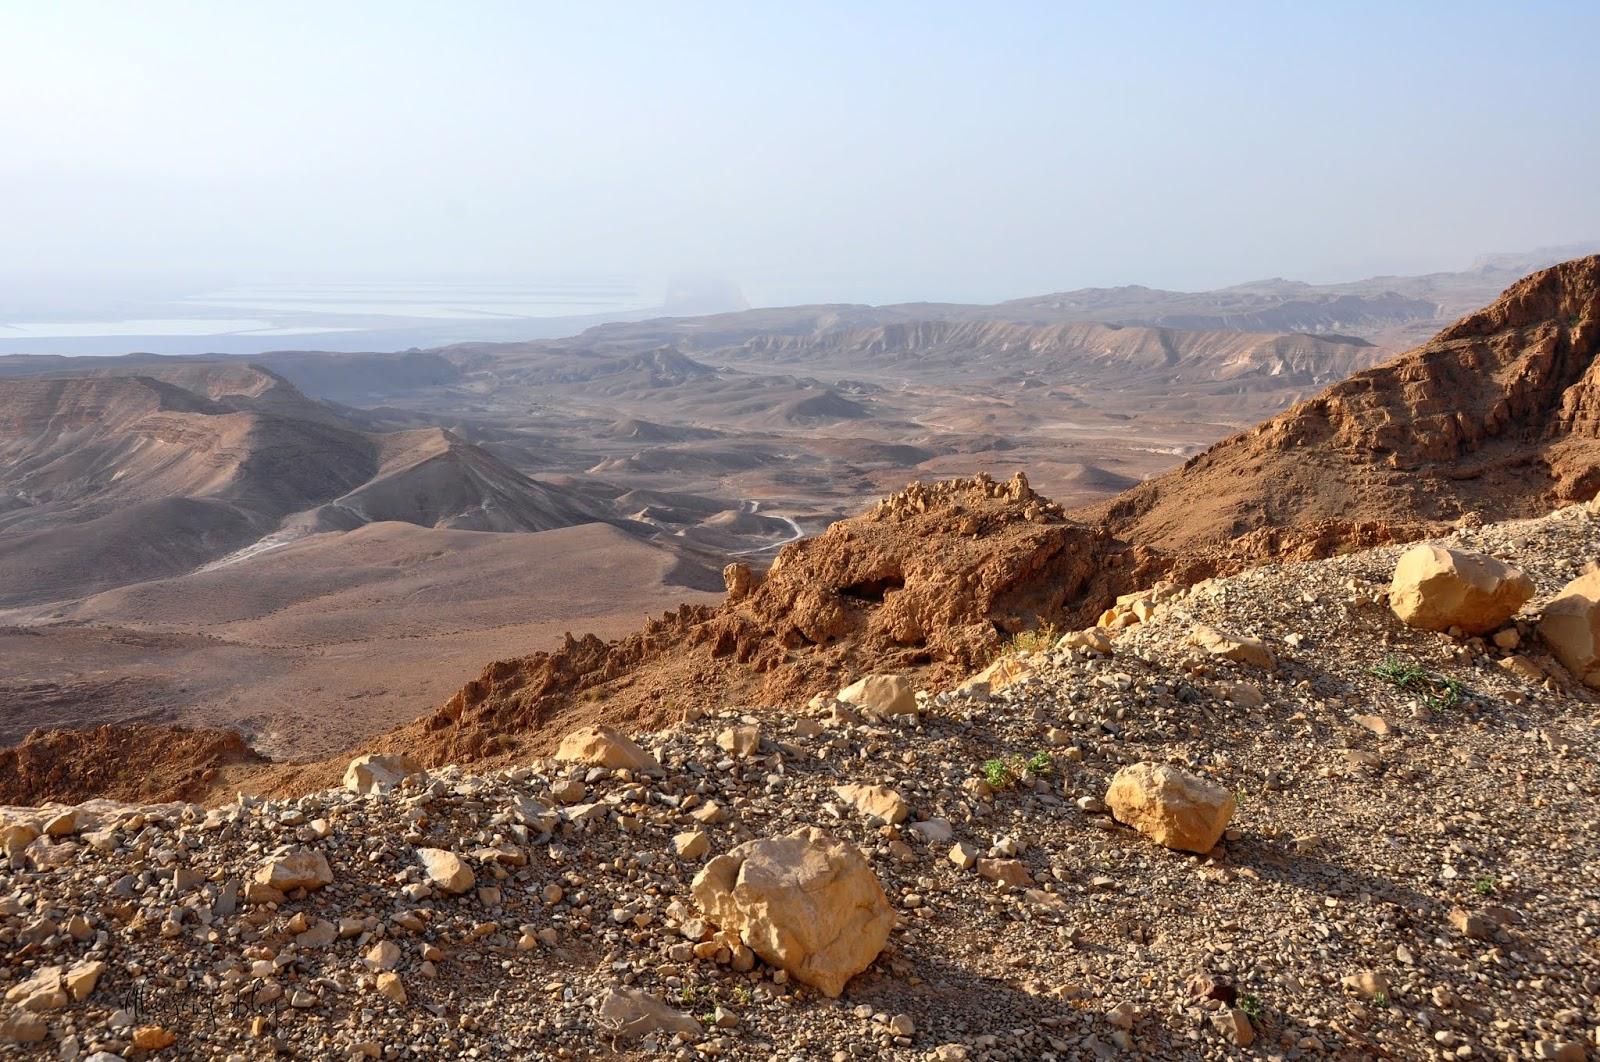 Izrael - Morze Martwe i Park Narodowy Enot Tsukim/Ein Feshkha.